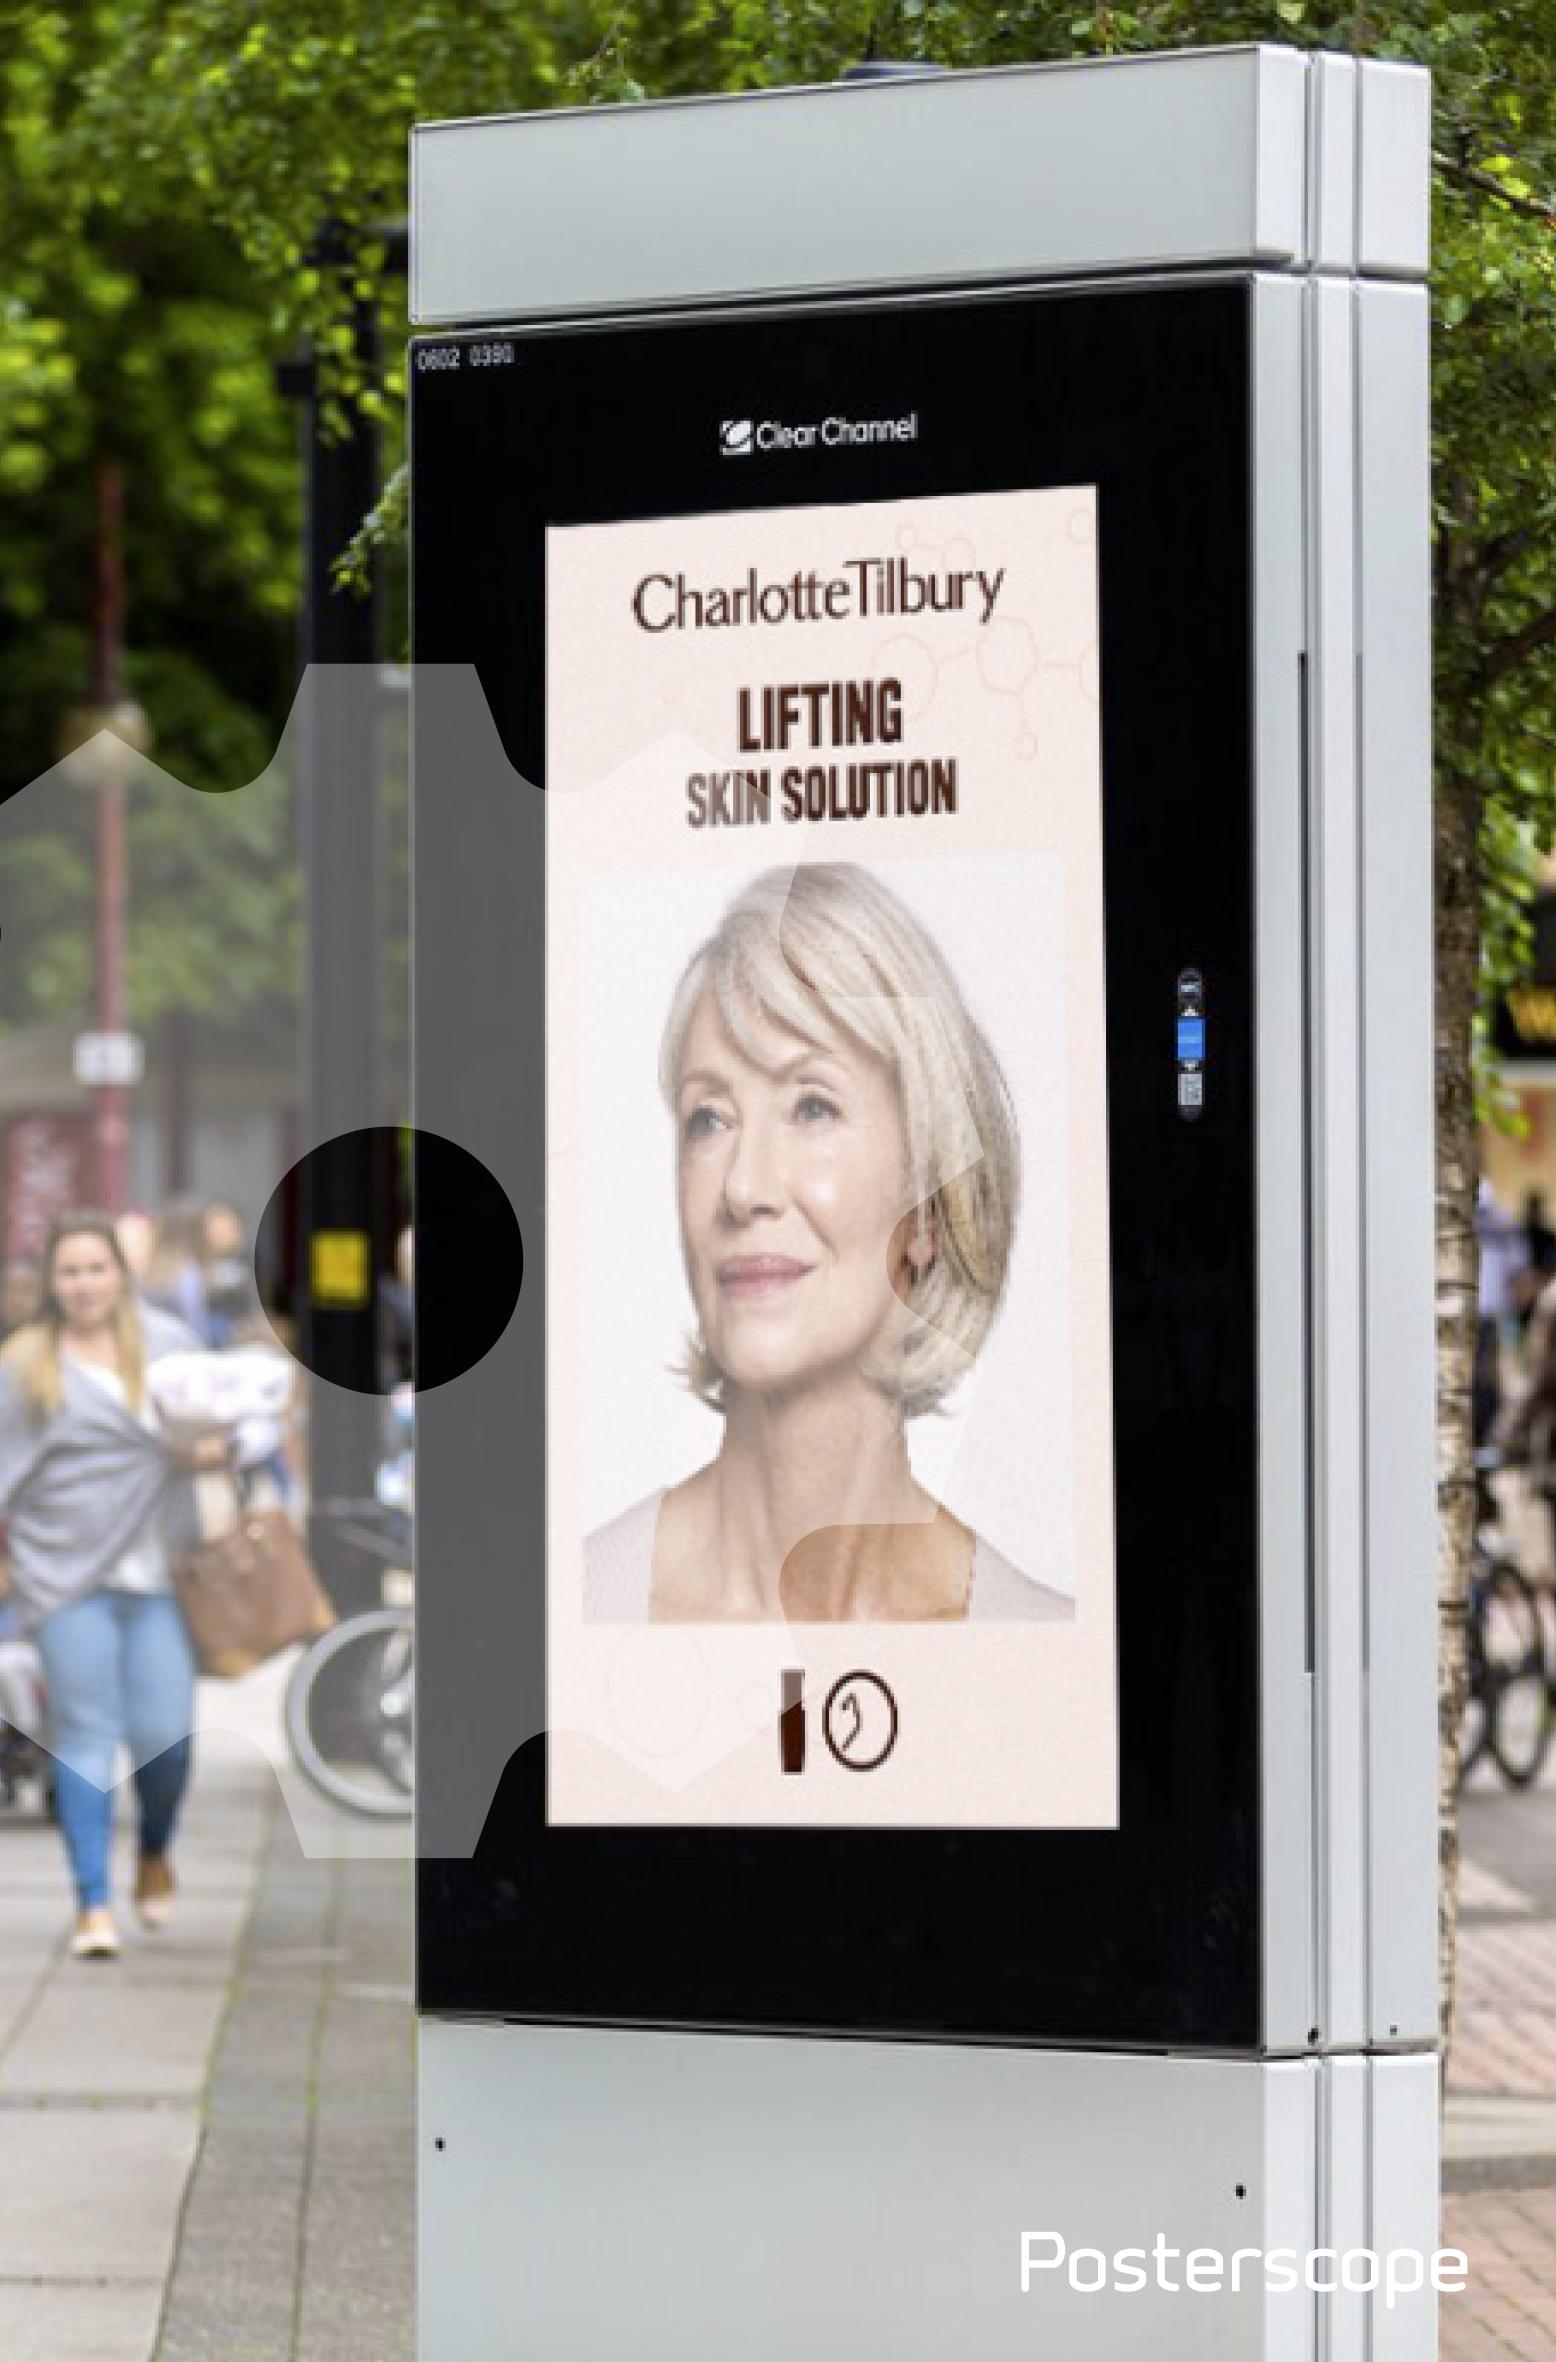 Charlotte-Tilbury-billboard